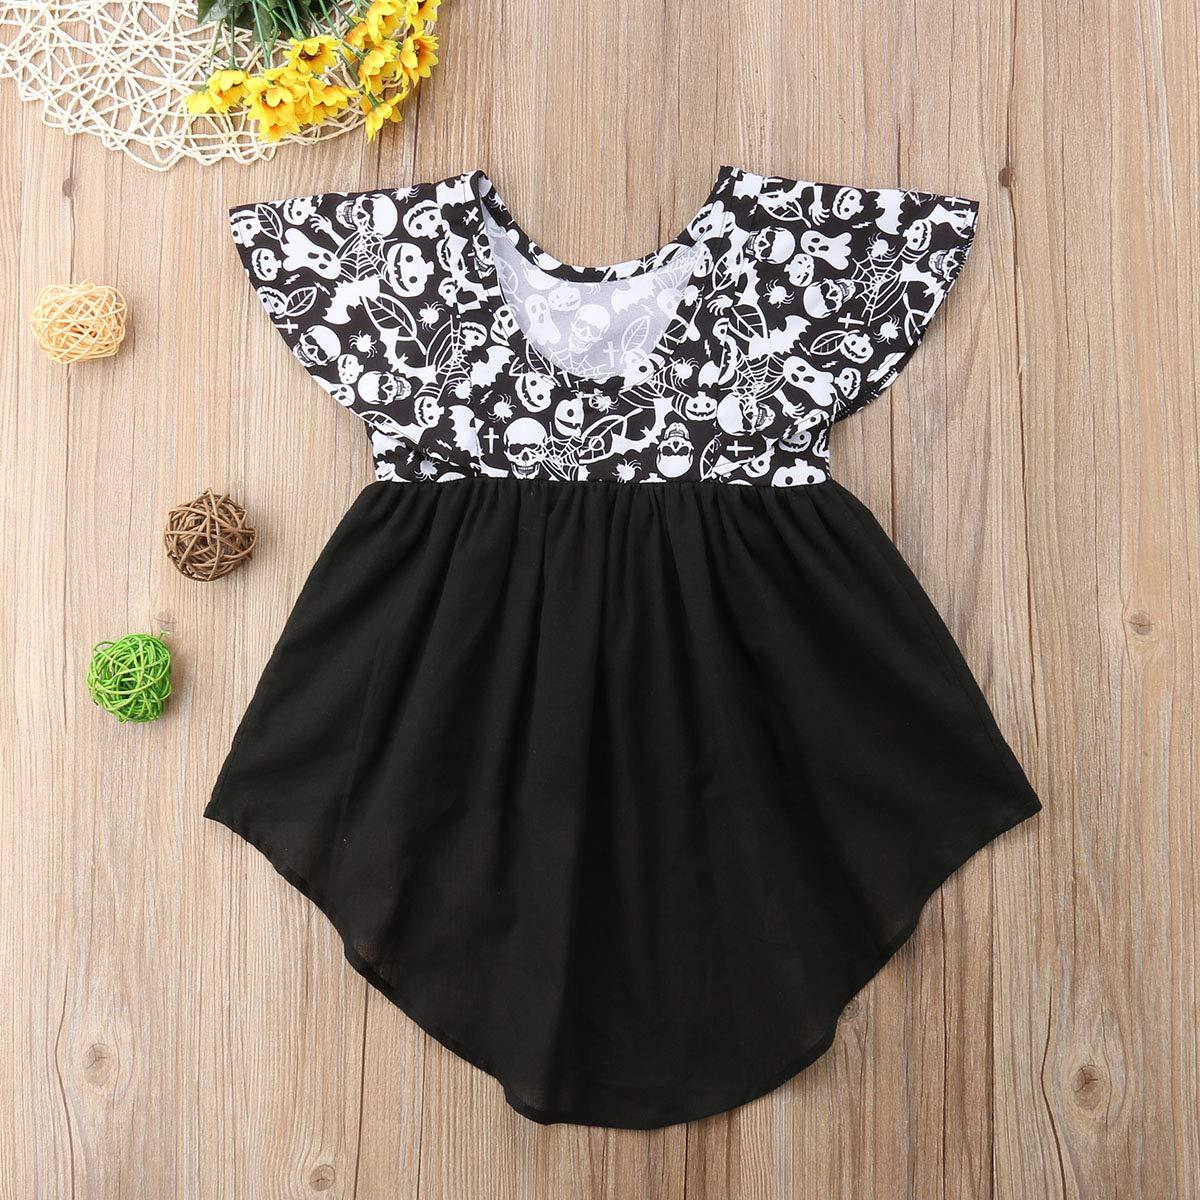 WenaZao Infant Baby Girls Halloween Dress Ghost Print Dovetail Dress